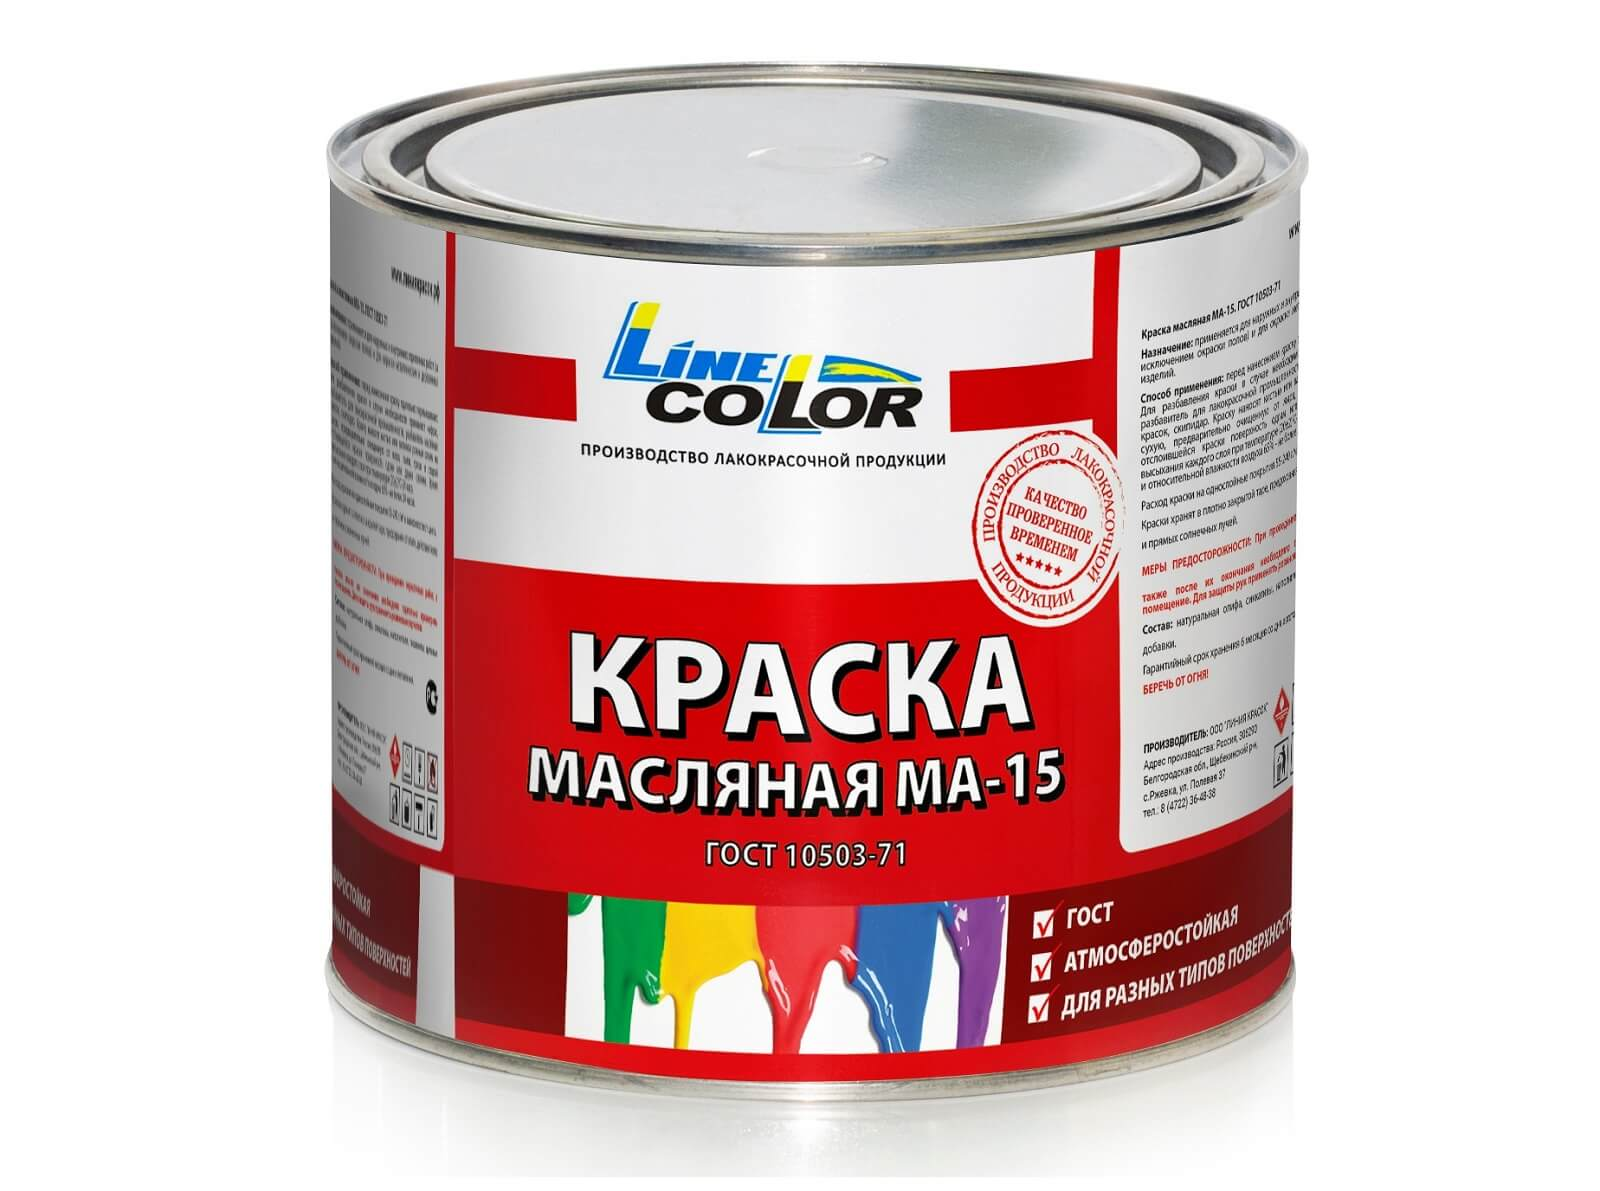 Фото масляной краски